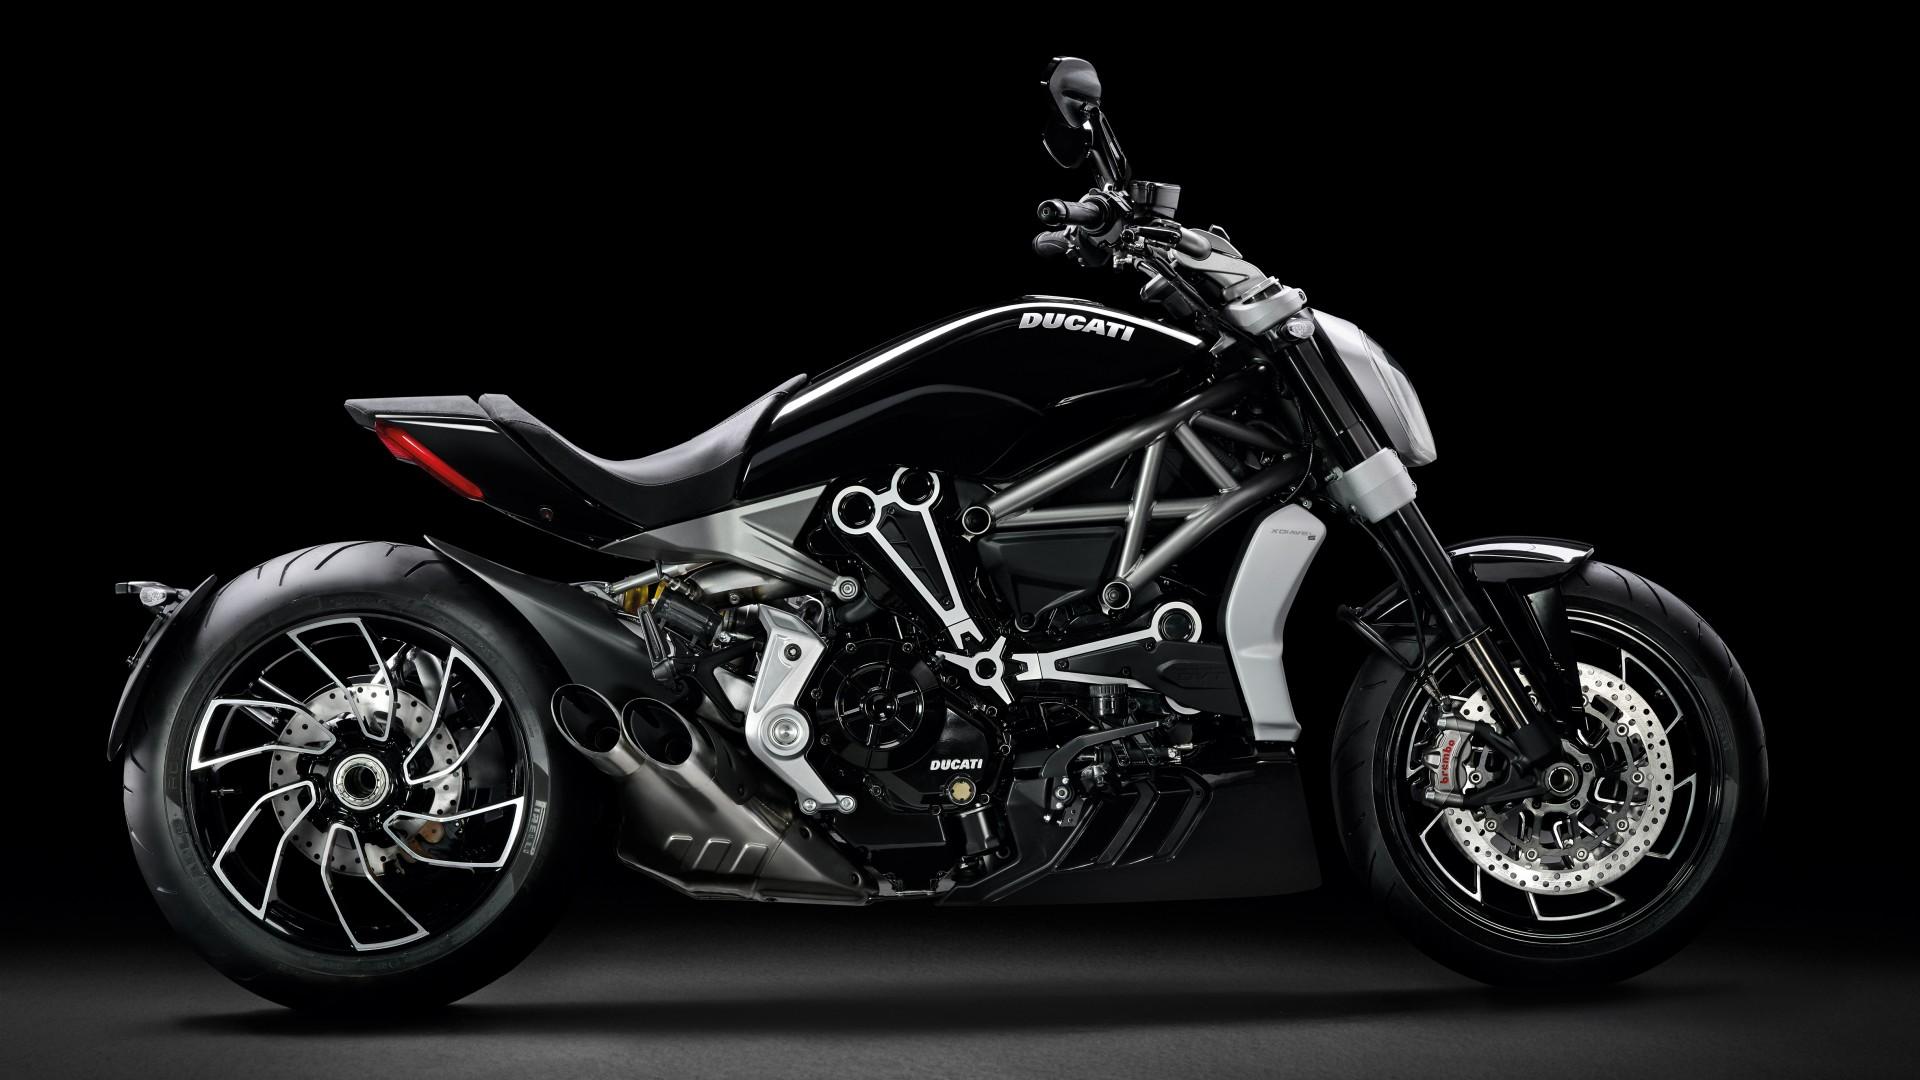 Ducati X Diaval S